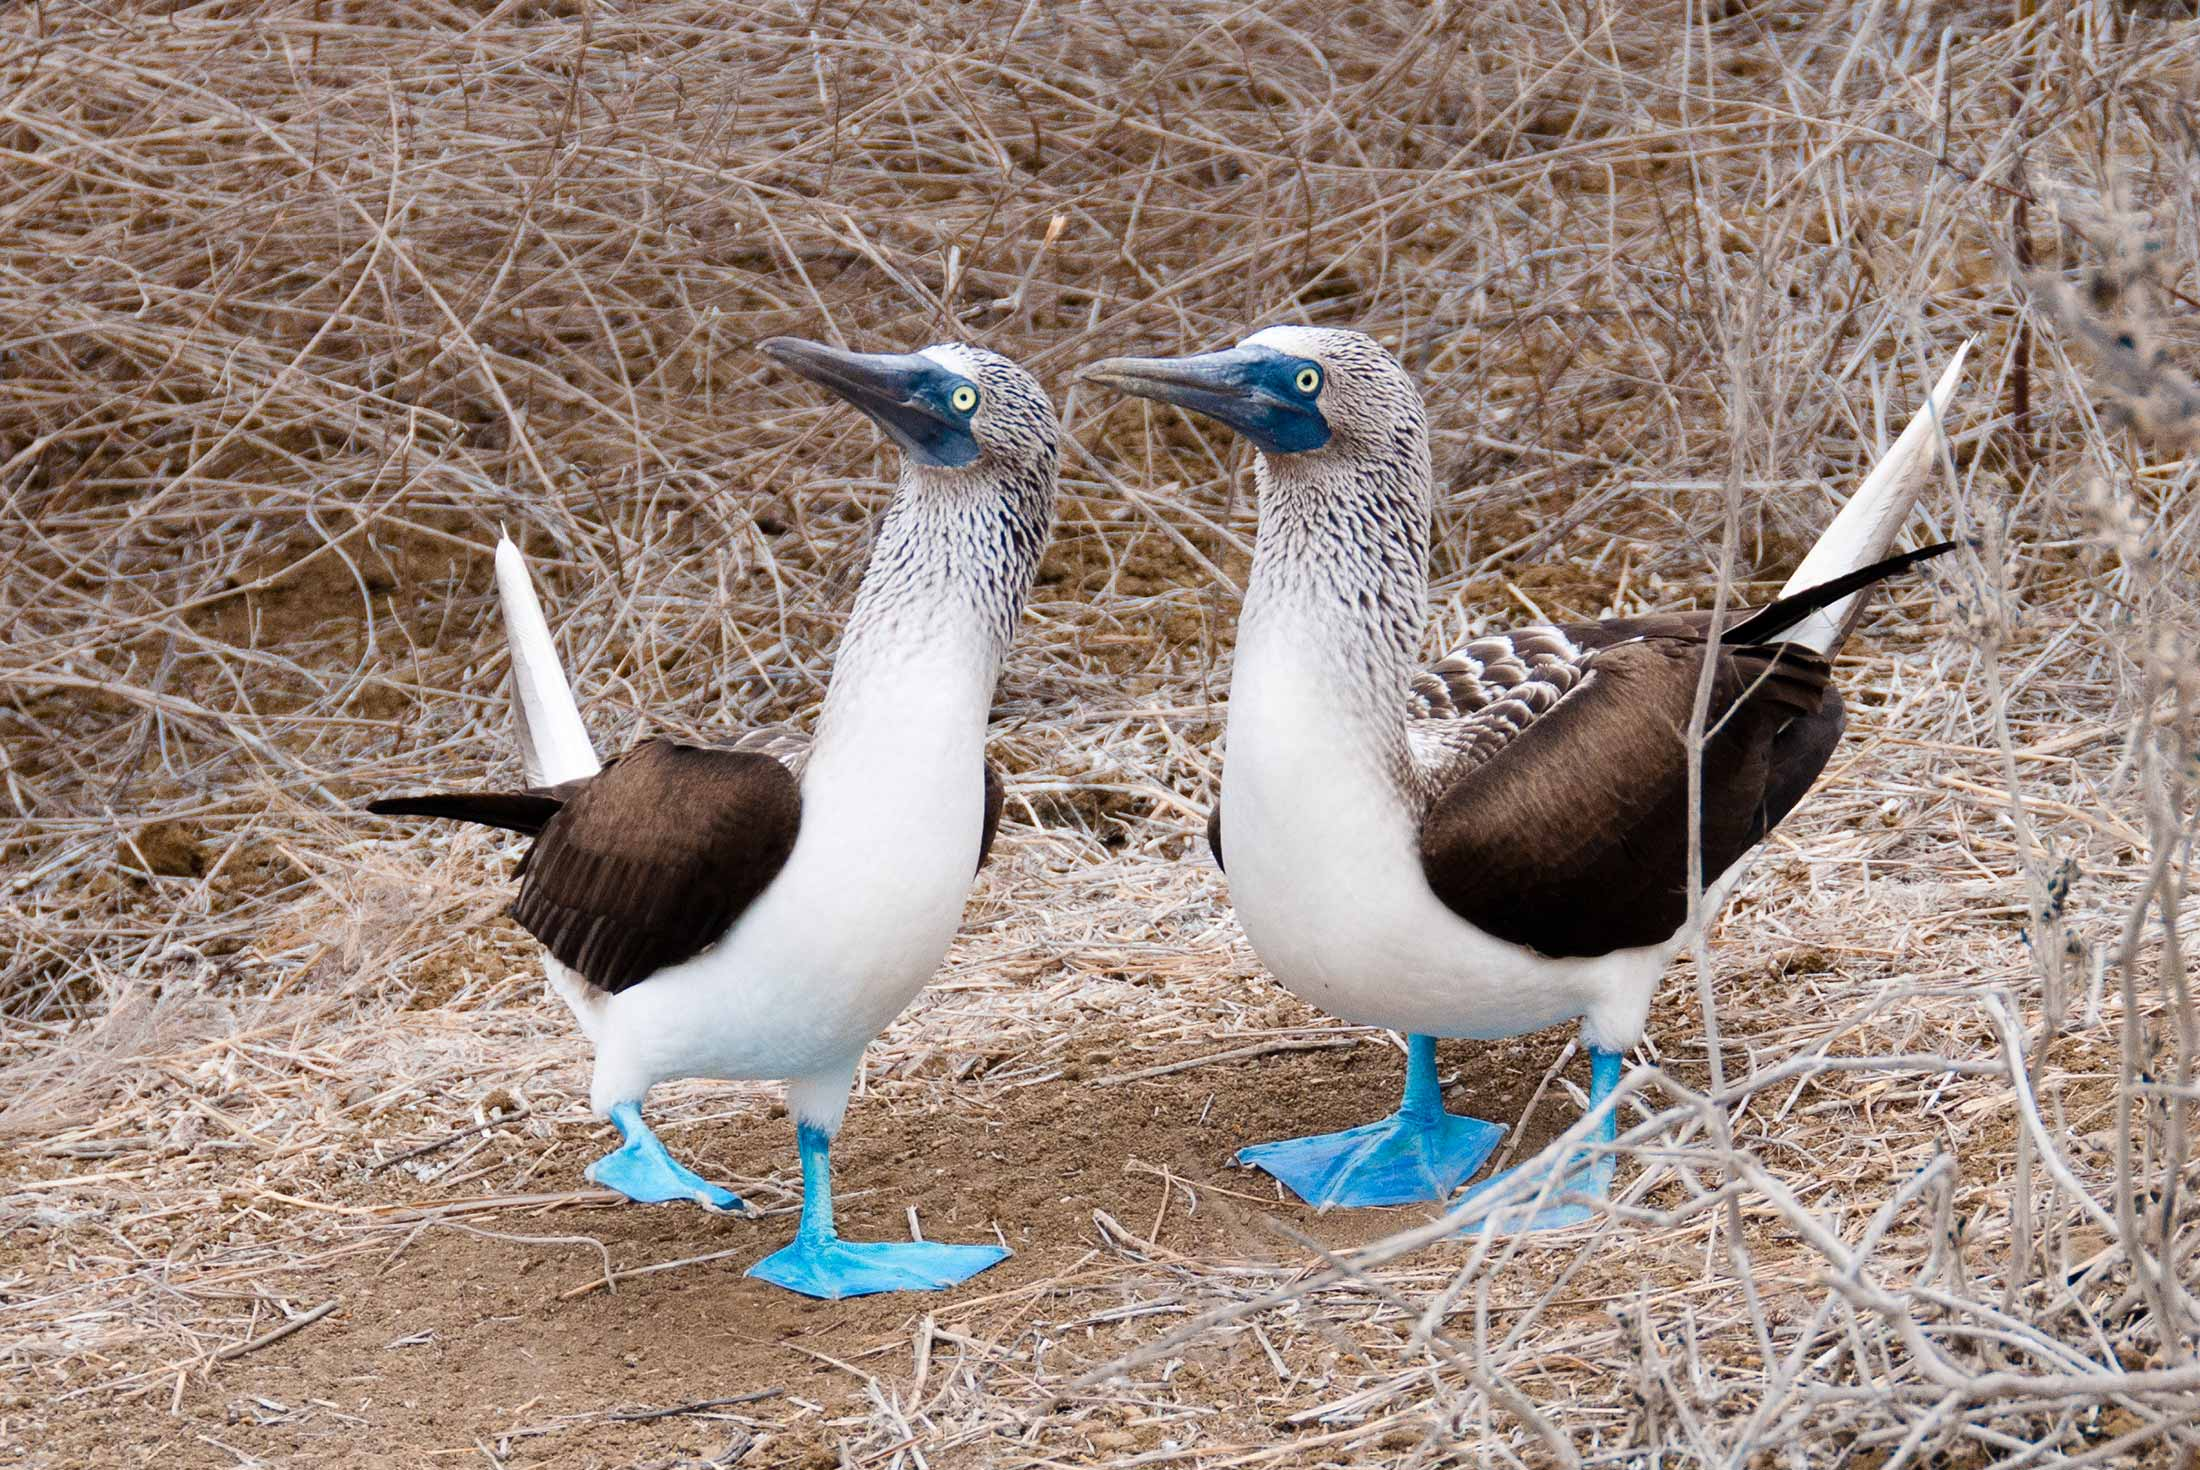 One Week in the Galapagos Islands 3